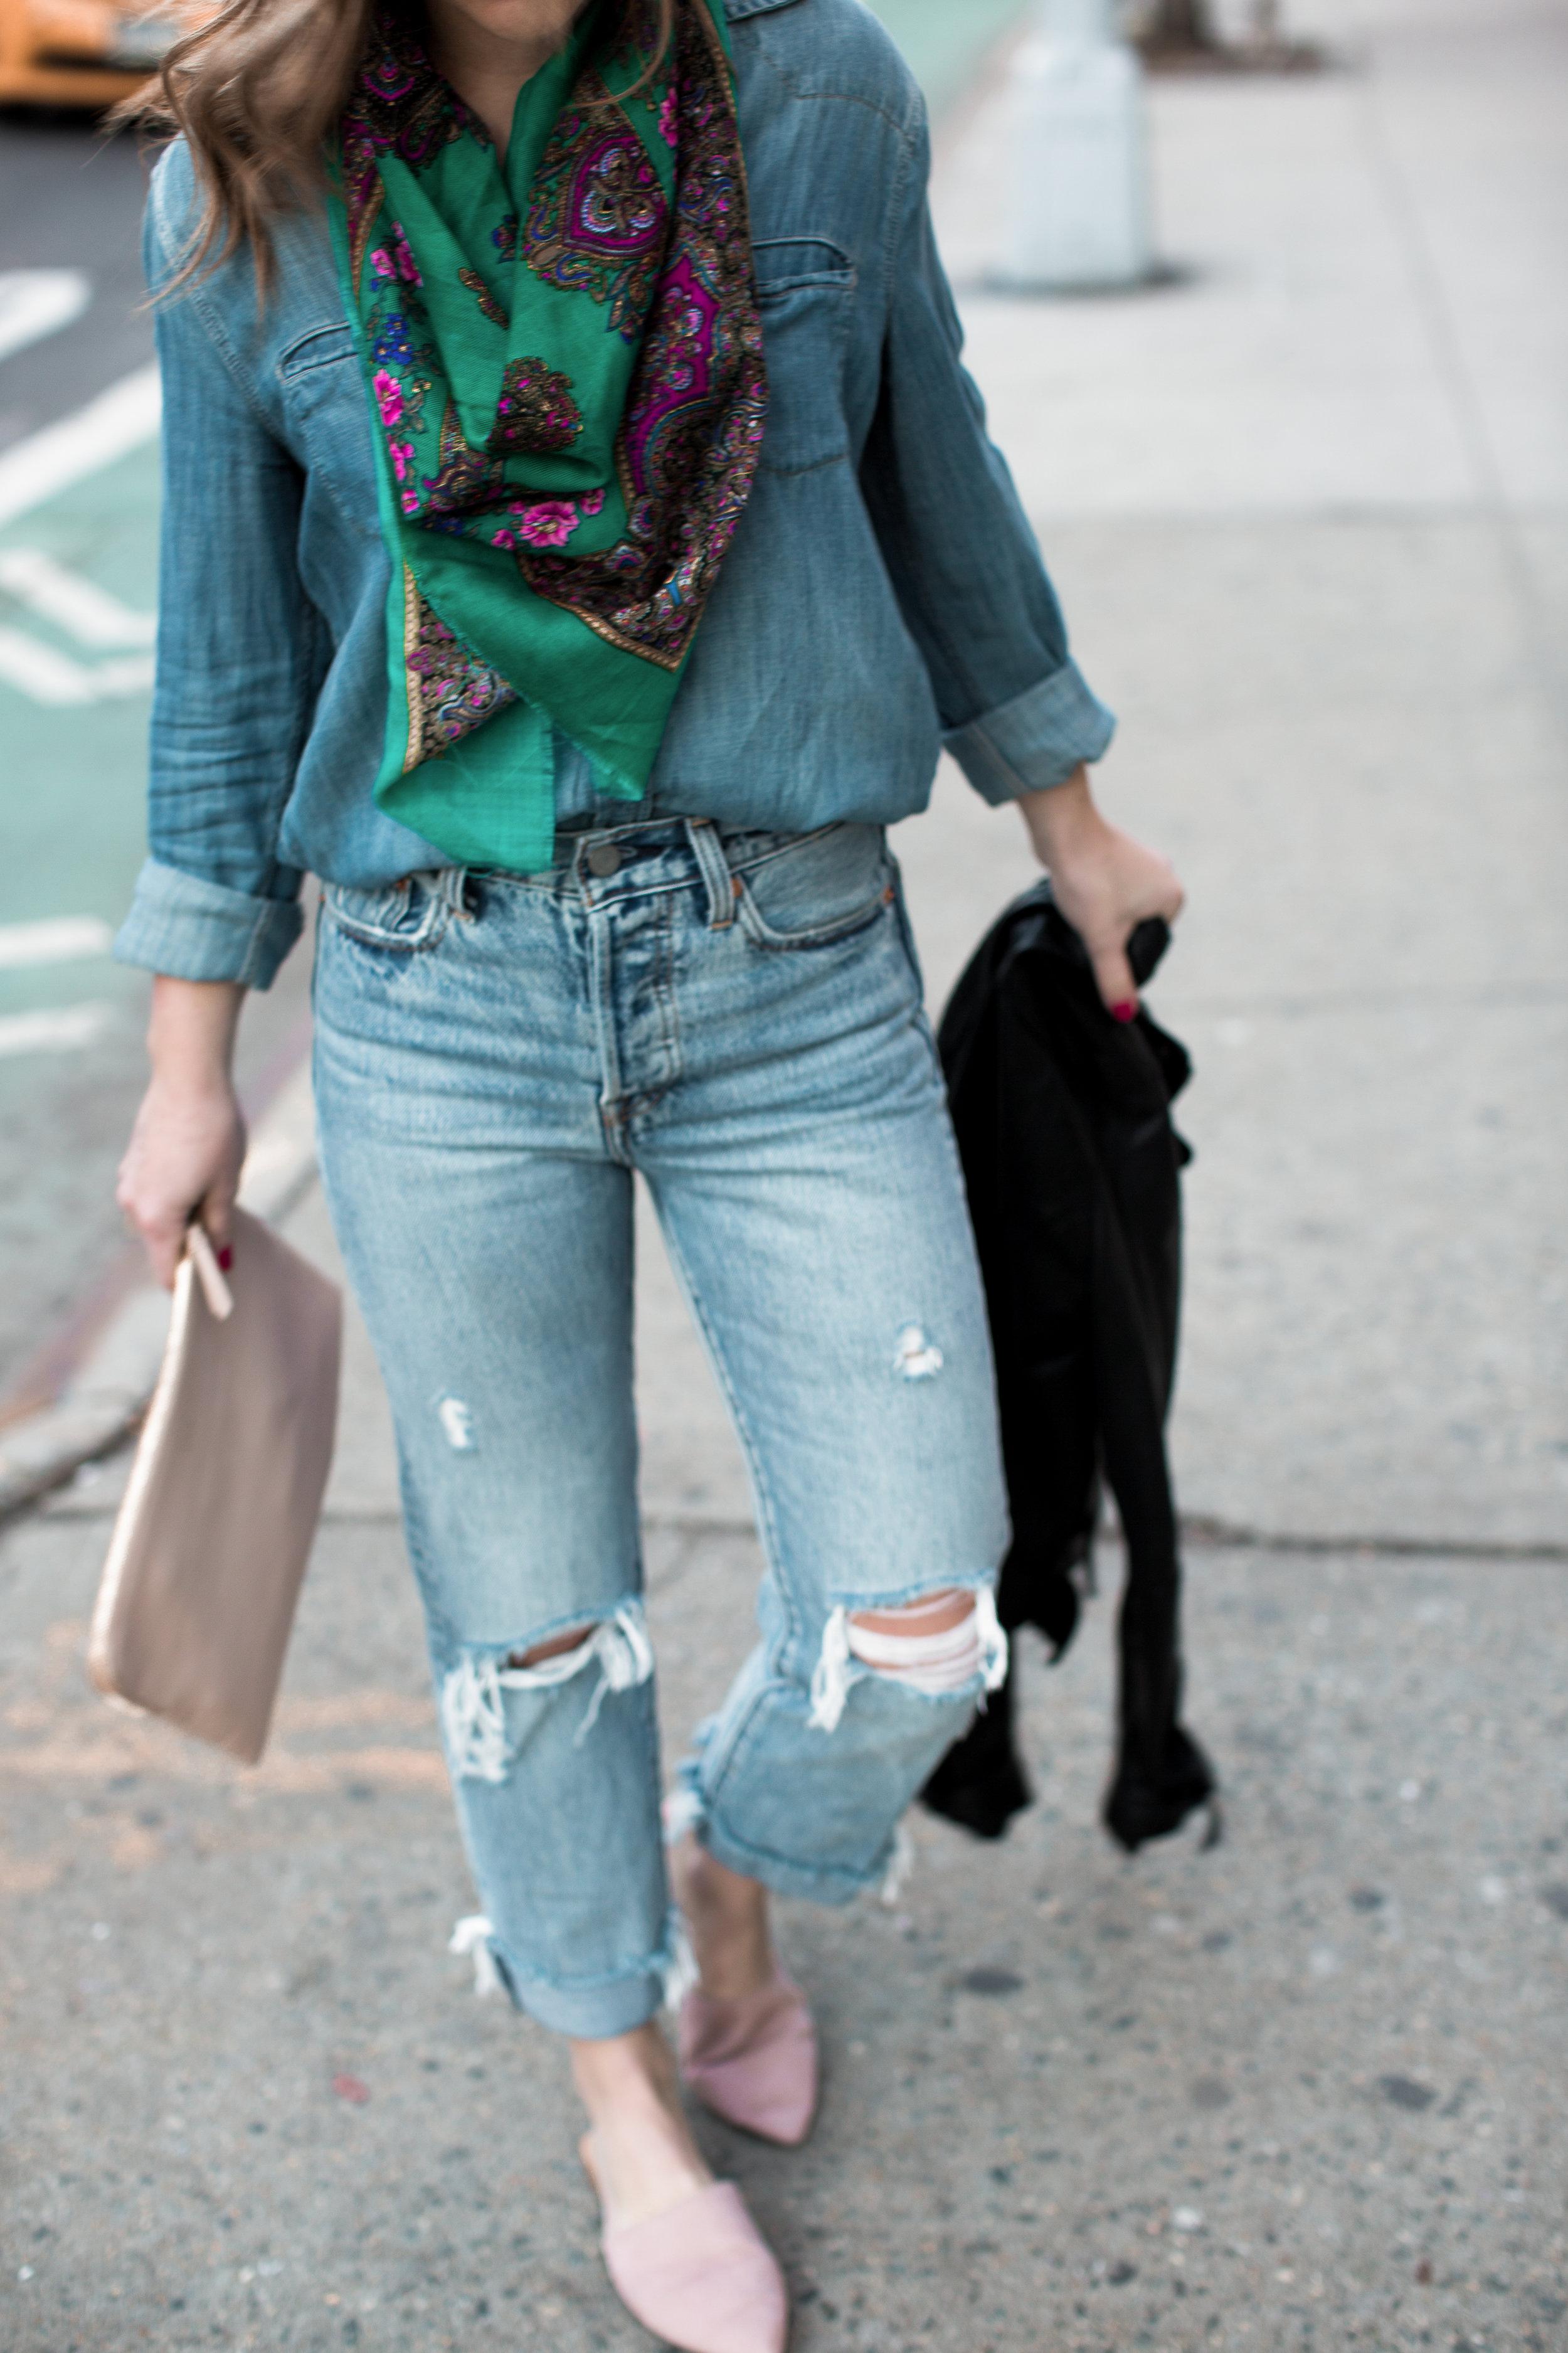 fizz-fade-green-vintage-scarf-10.jpg